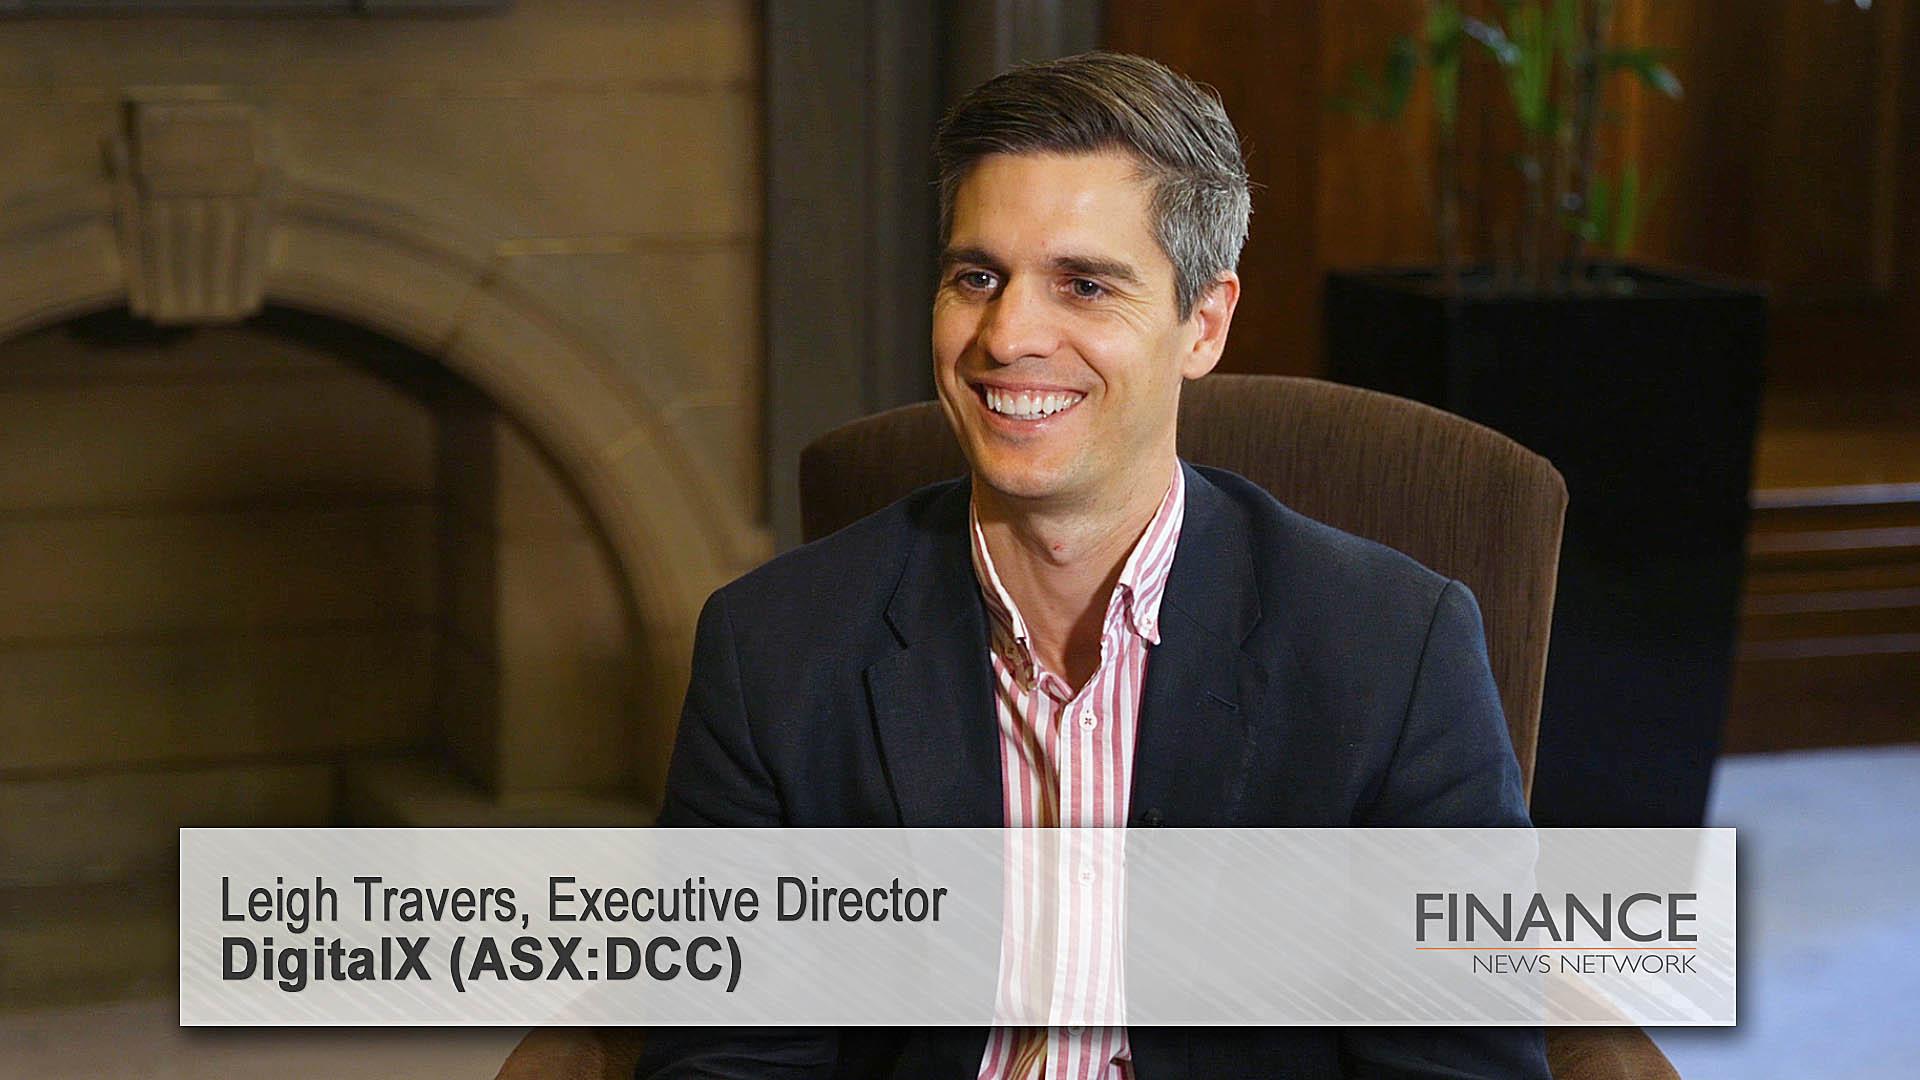 DigitalX (ASX:DCC) - blockchain specialist